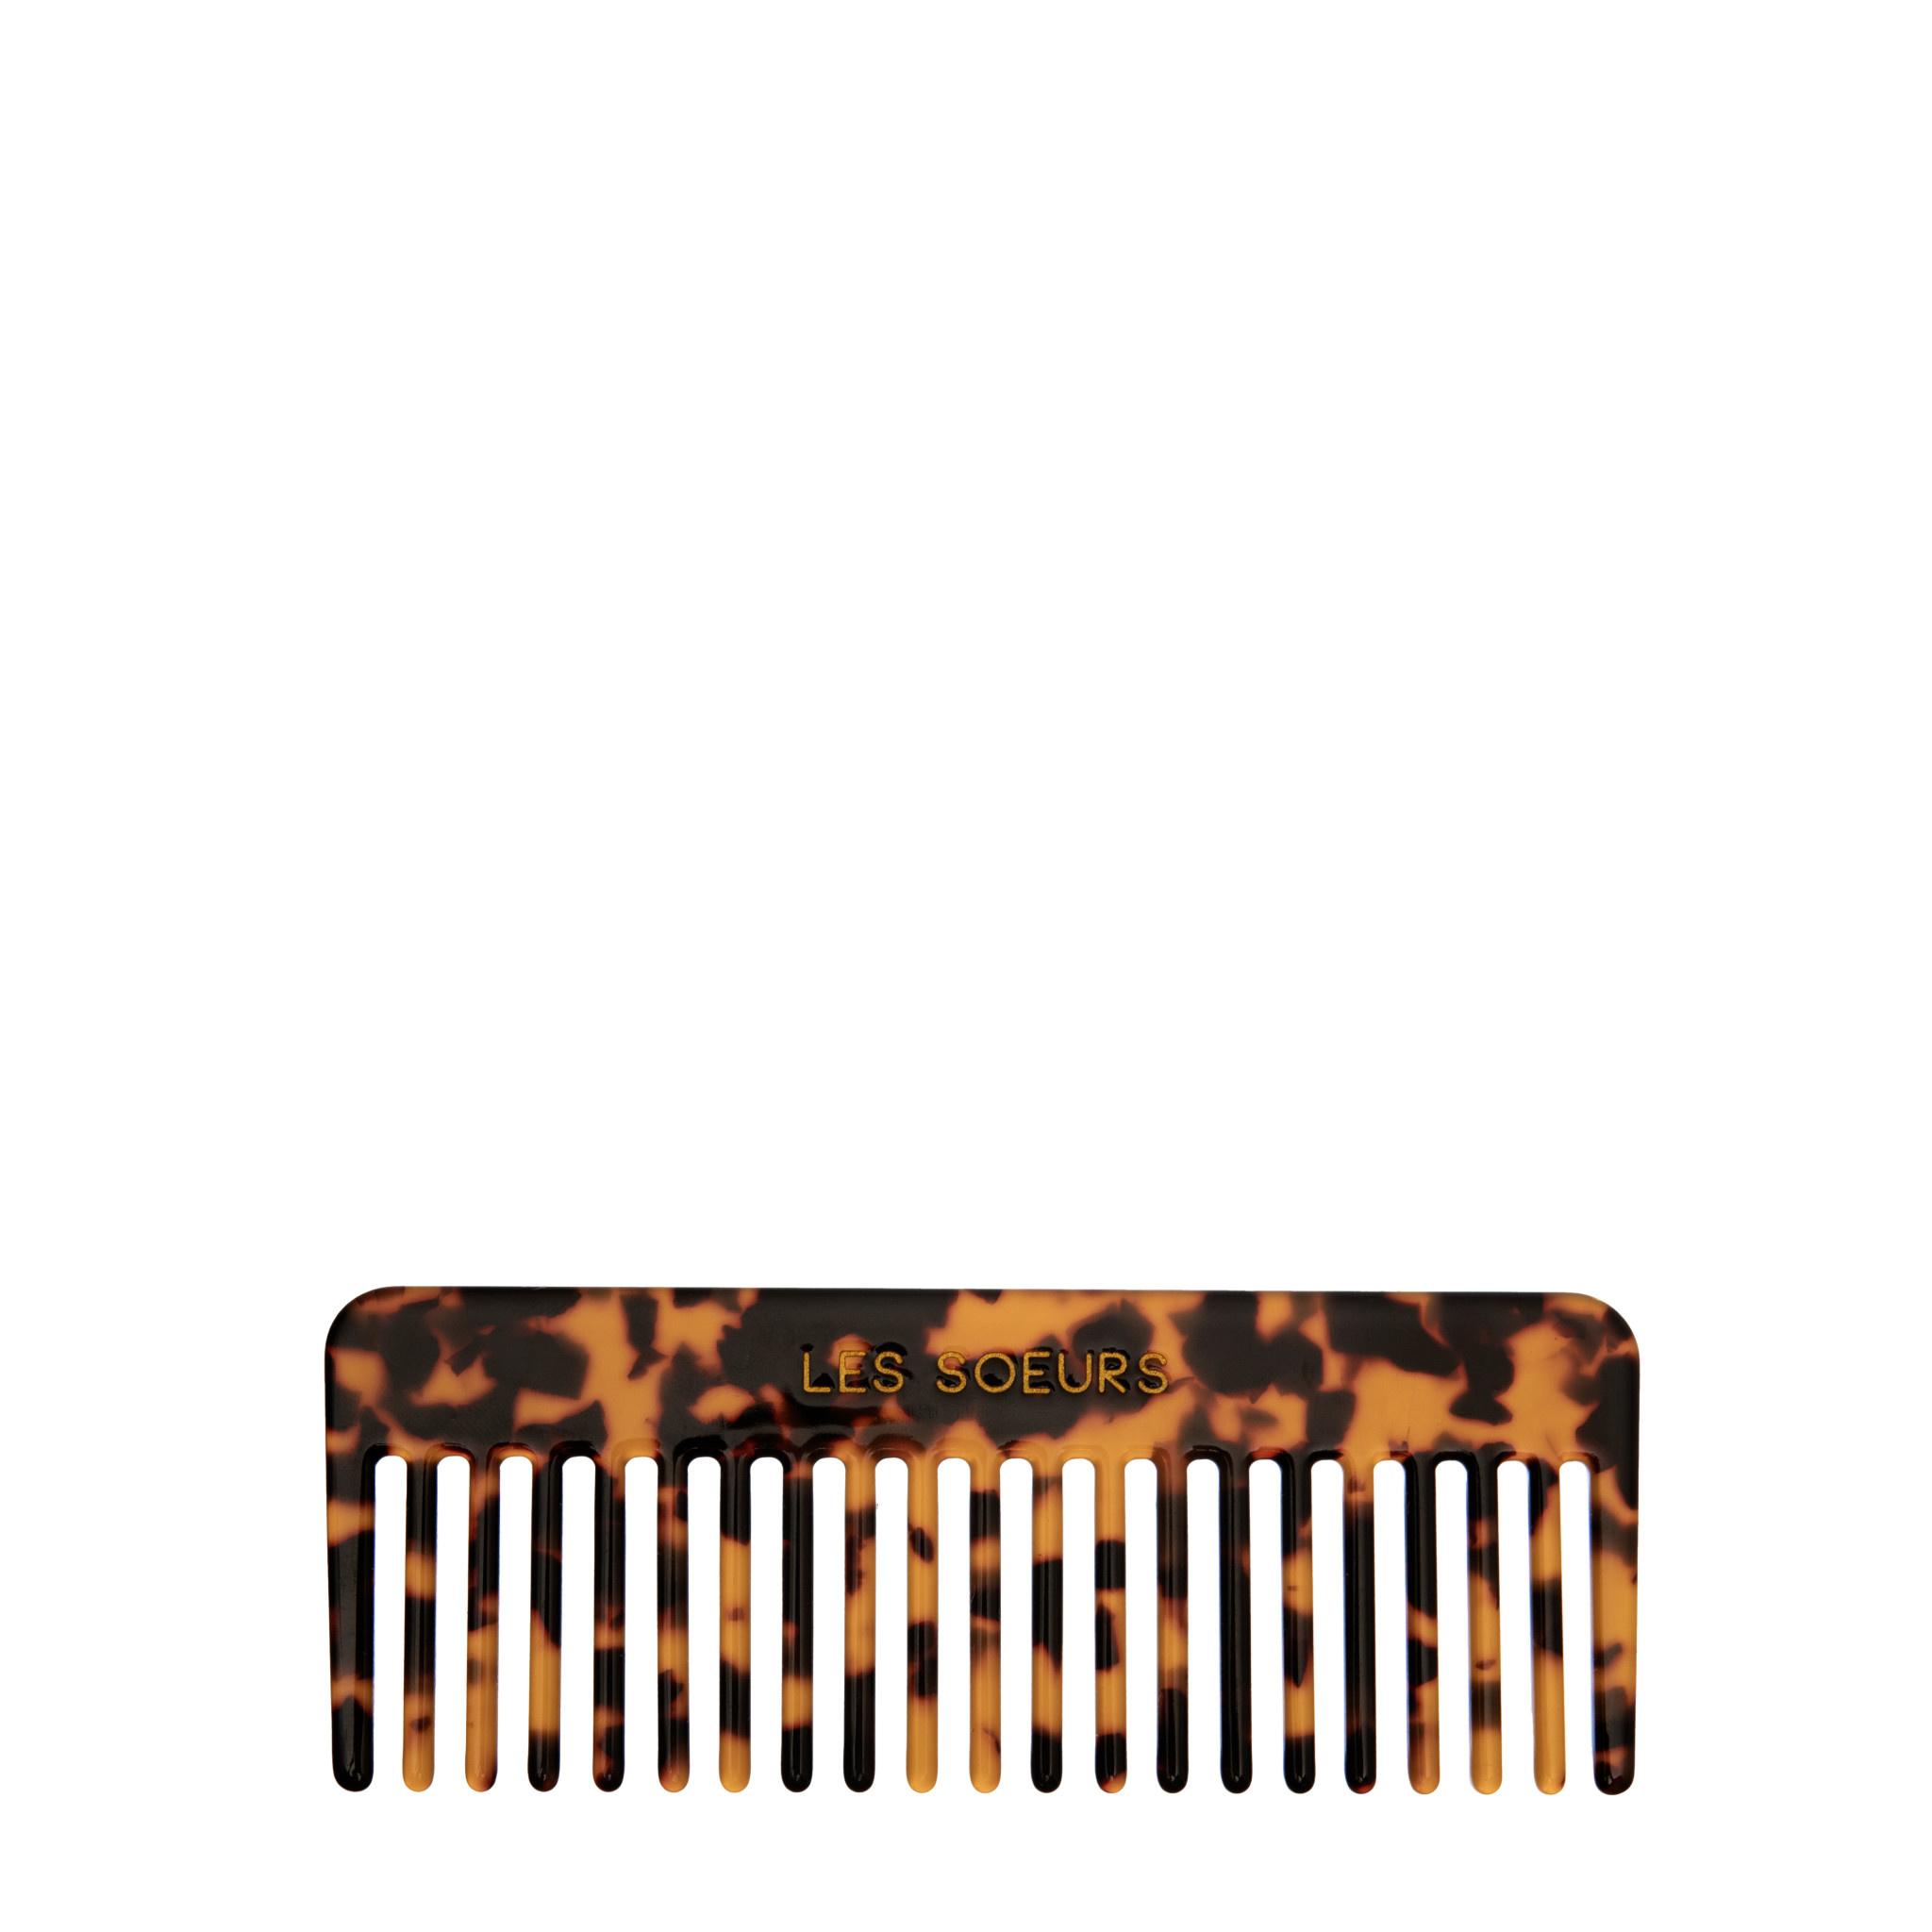 Resin Comb